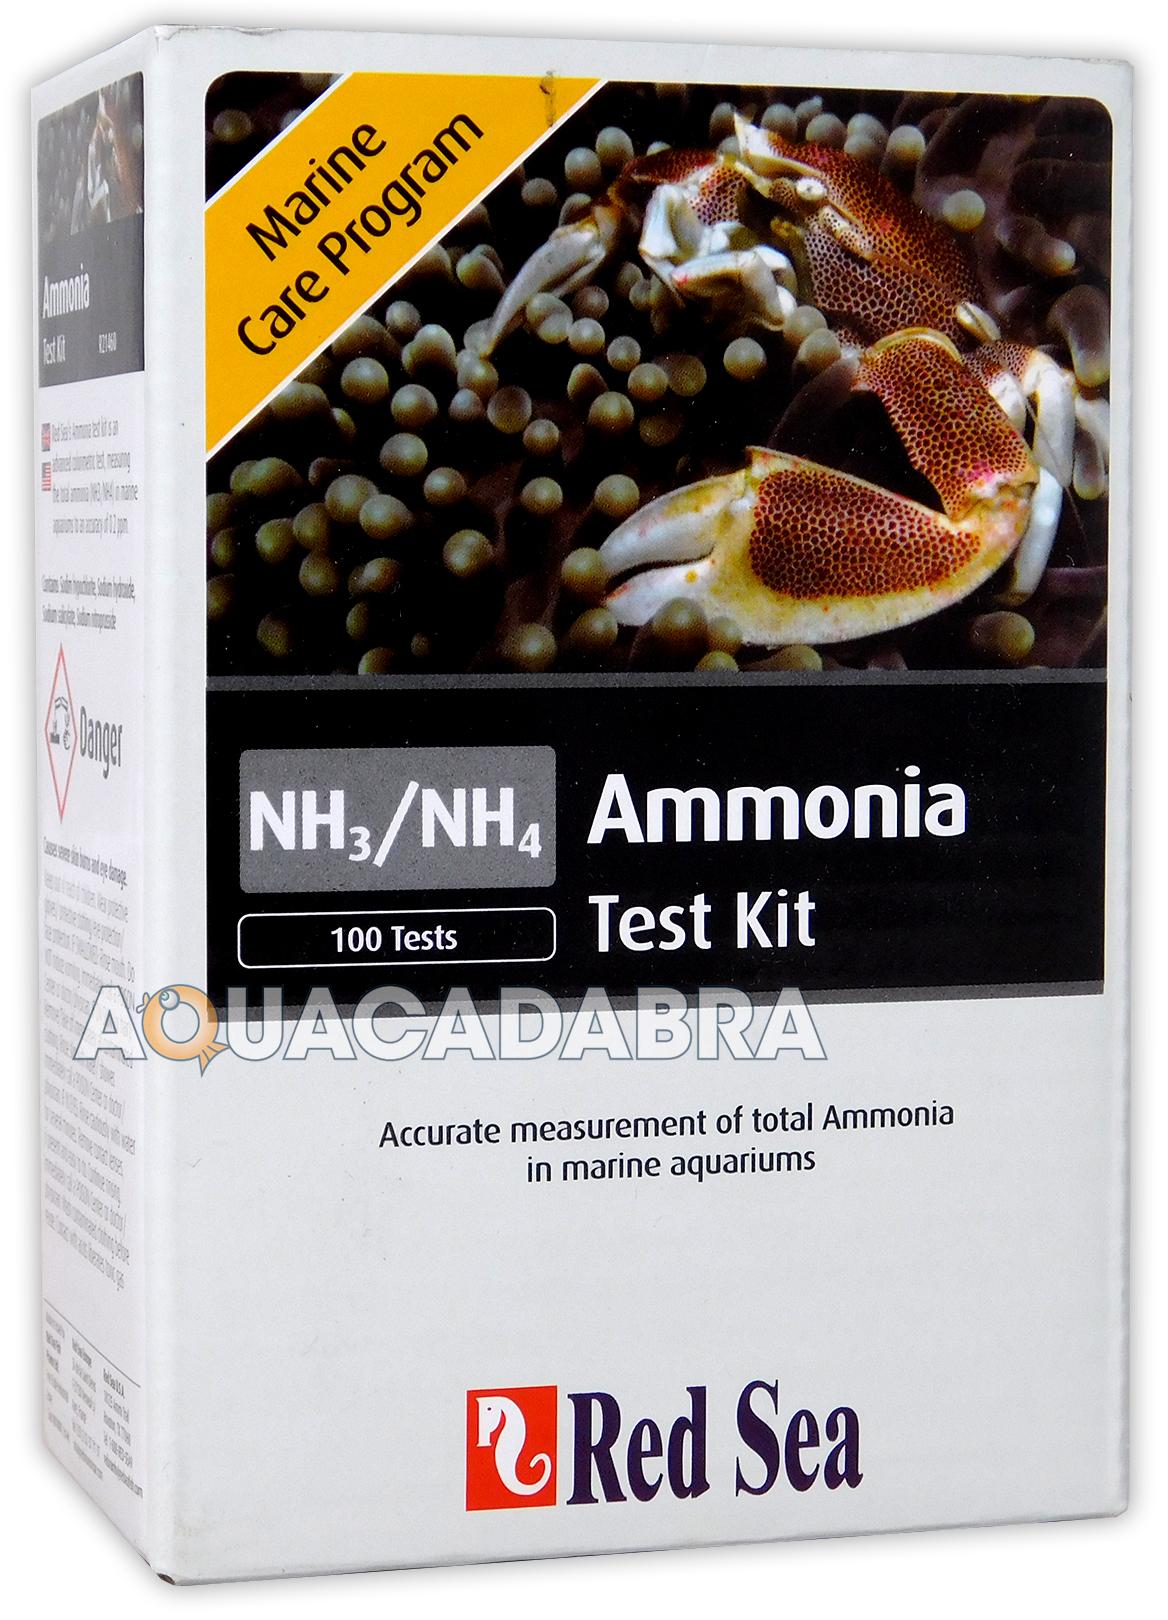 Red sea ammonia test kit nh3 nh4 marine care program fish for Ammonia in fish tank